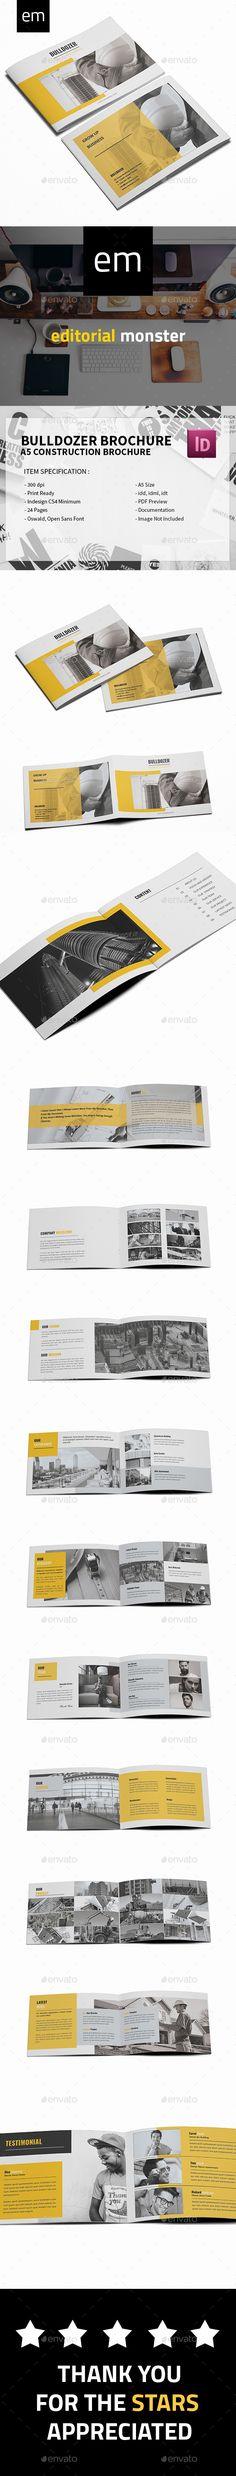 Bulldozer - A5 Construction Brochure Template - #Corporate #Brochures Download here: https://graphicriver.net/item/bulldozer-a5-construction-brochure-template/19514954?ref=alena994